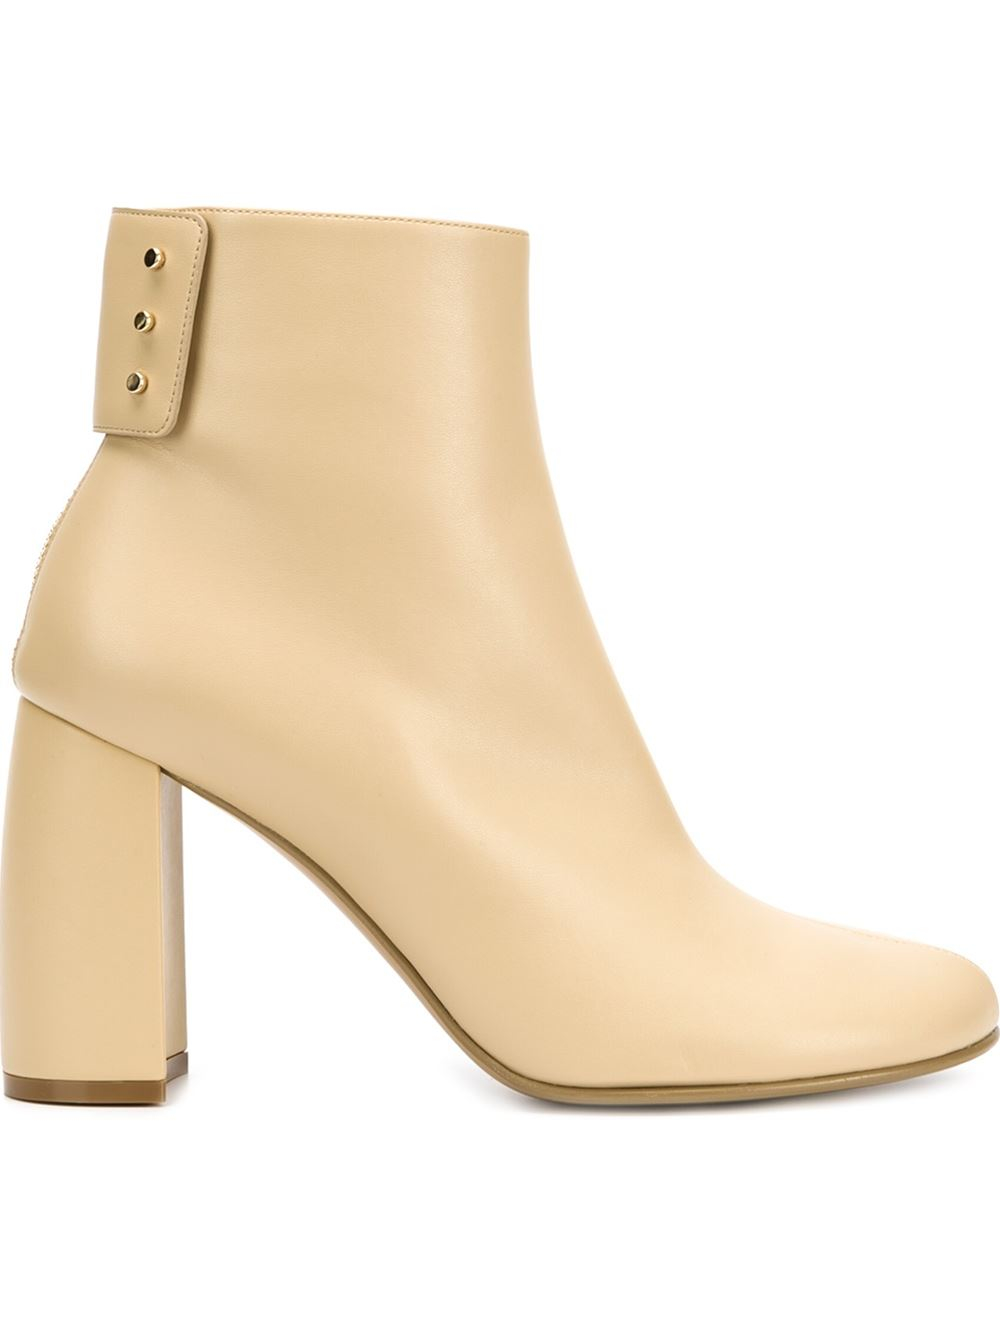 Stella mccartney Winter Show Faux-Leather Boots in Beige (nude ...